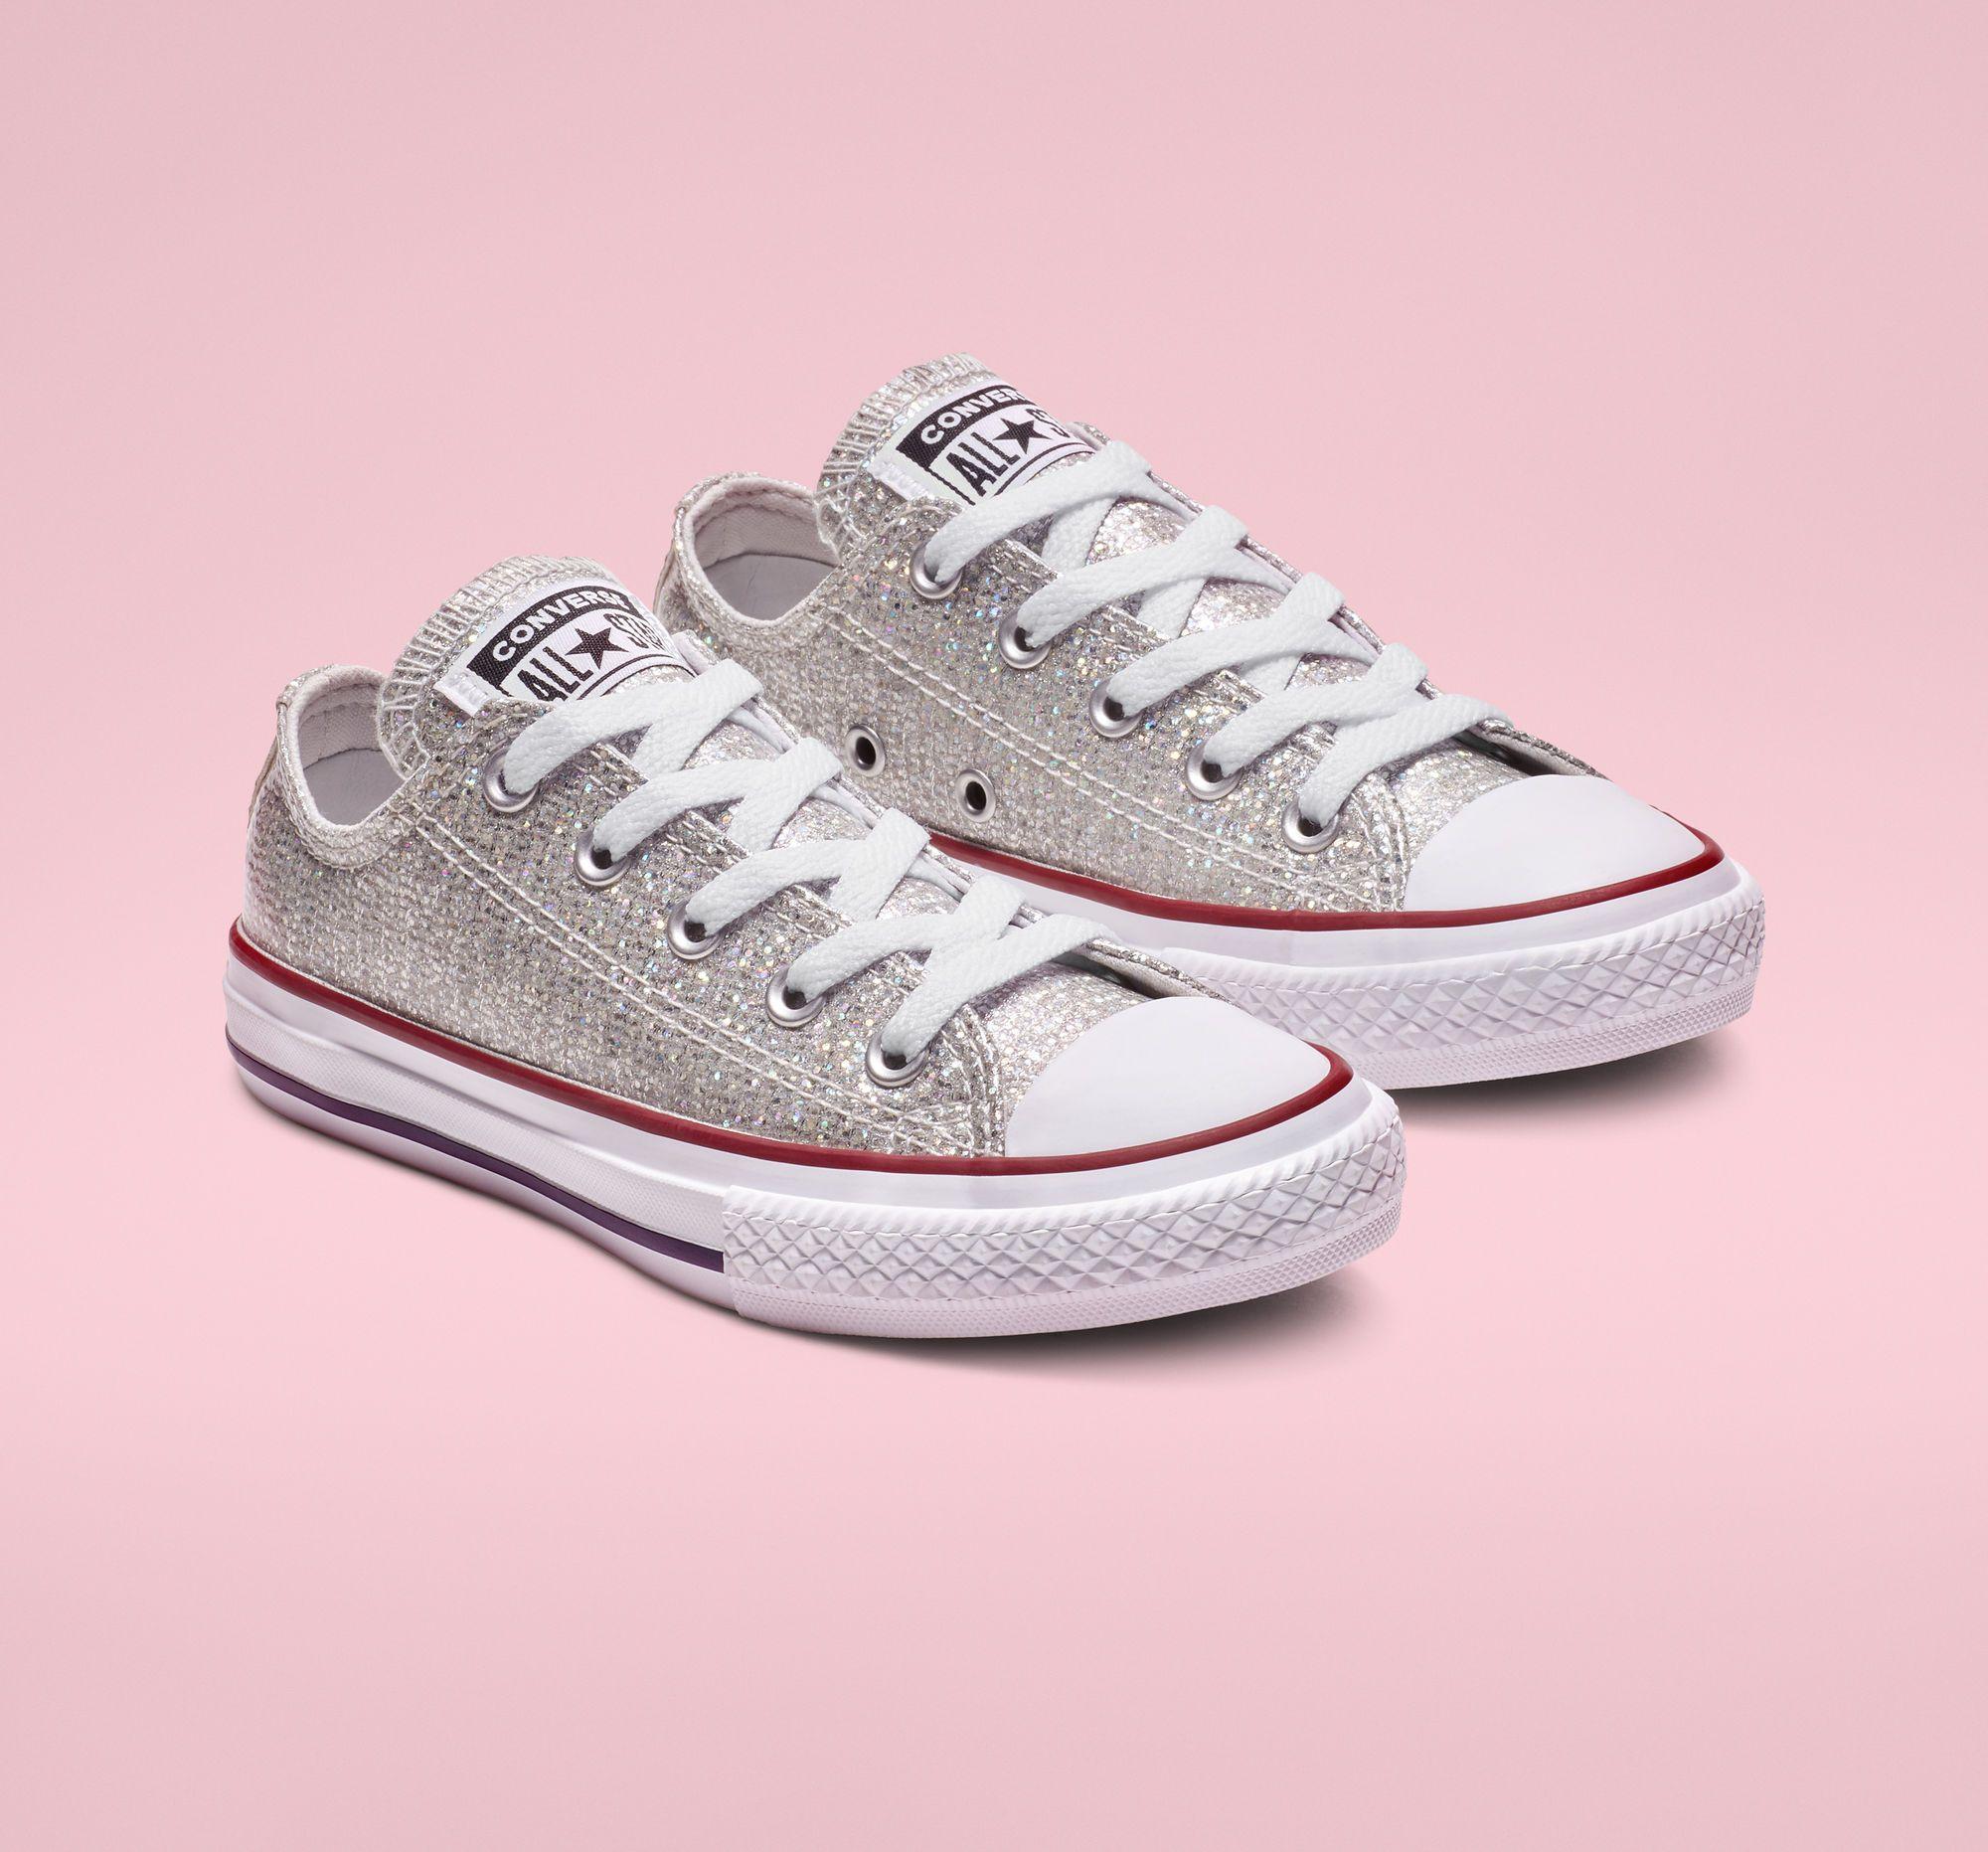 Kids converse shoes, Glitter converse